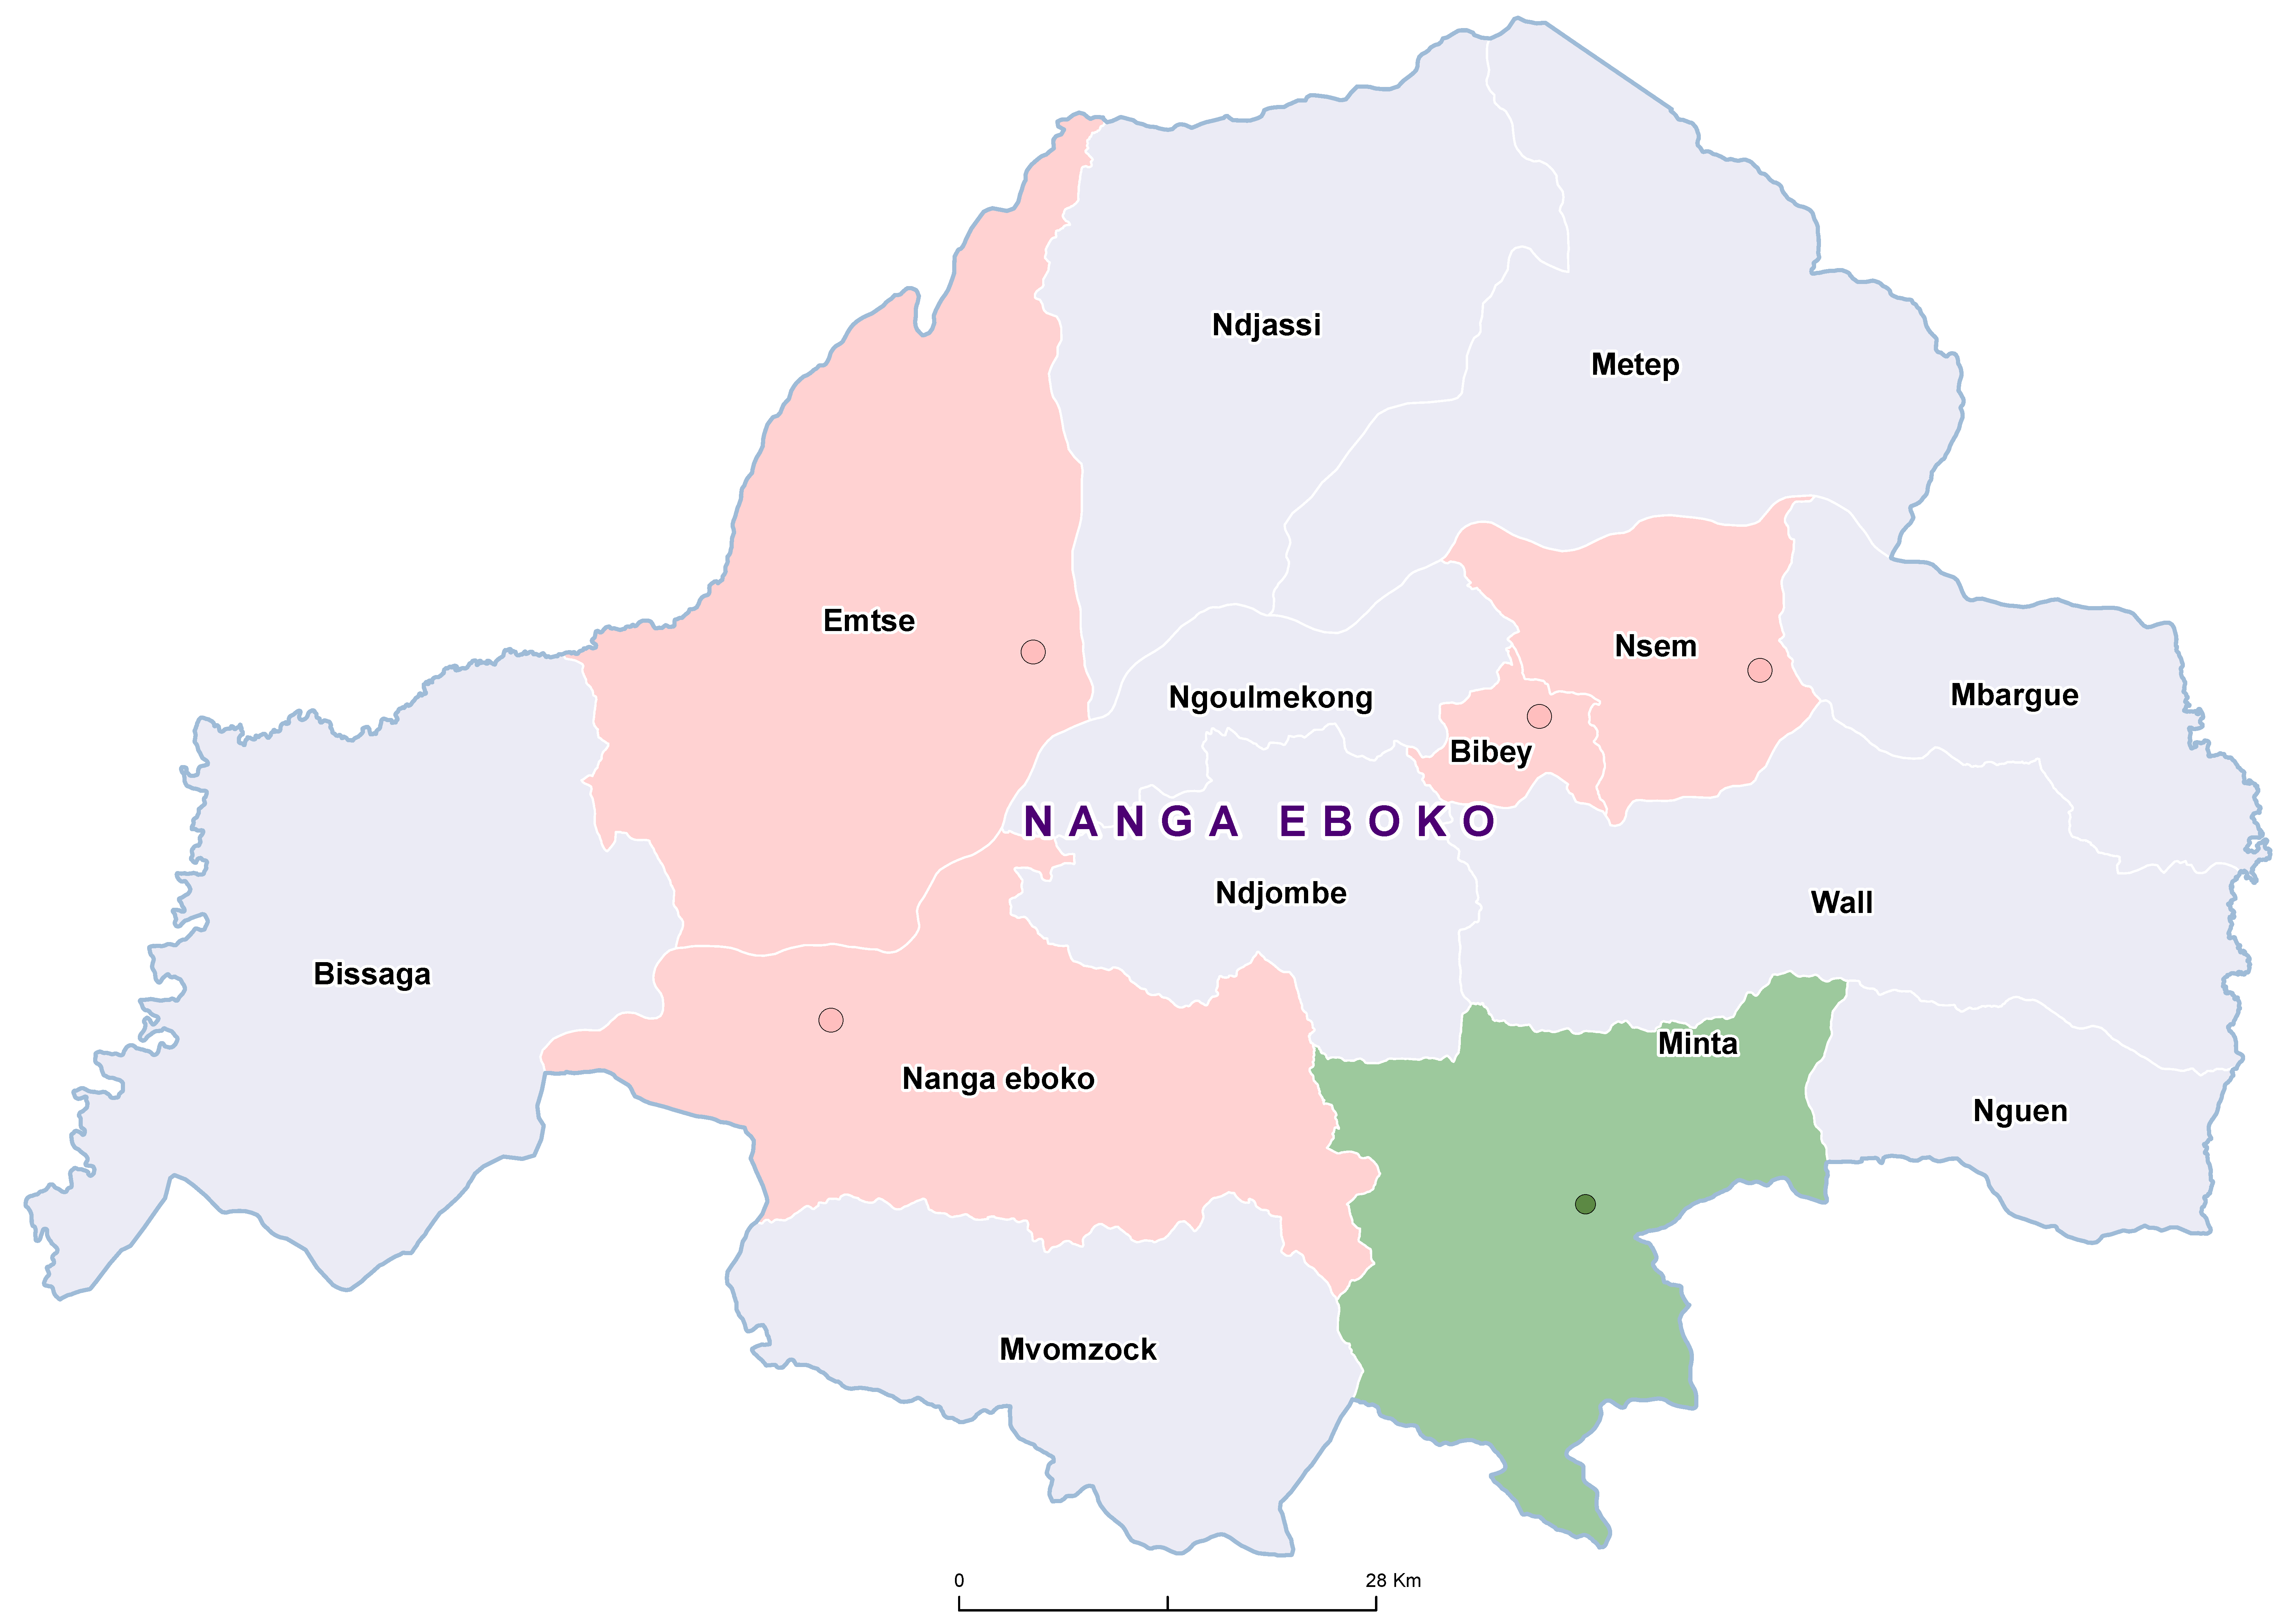 Nanga eboko SCH 19850001